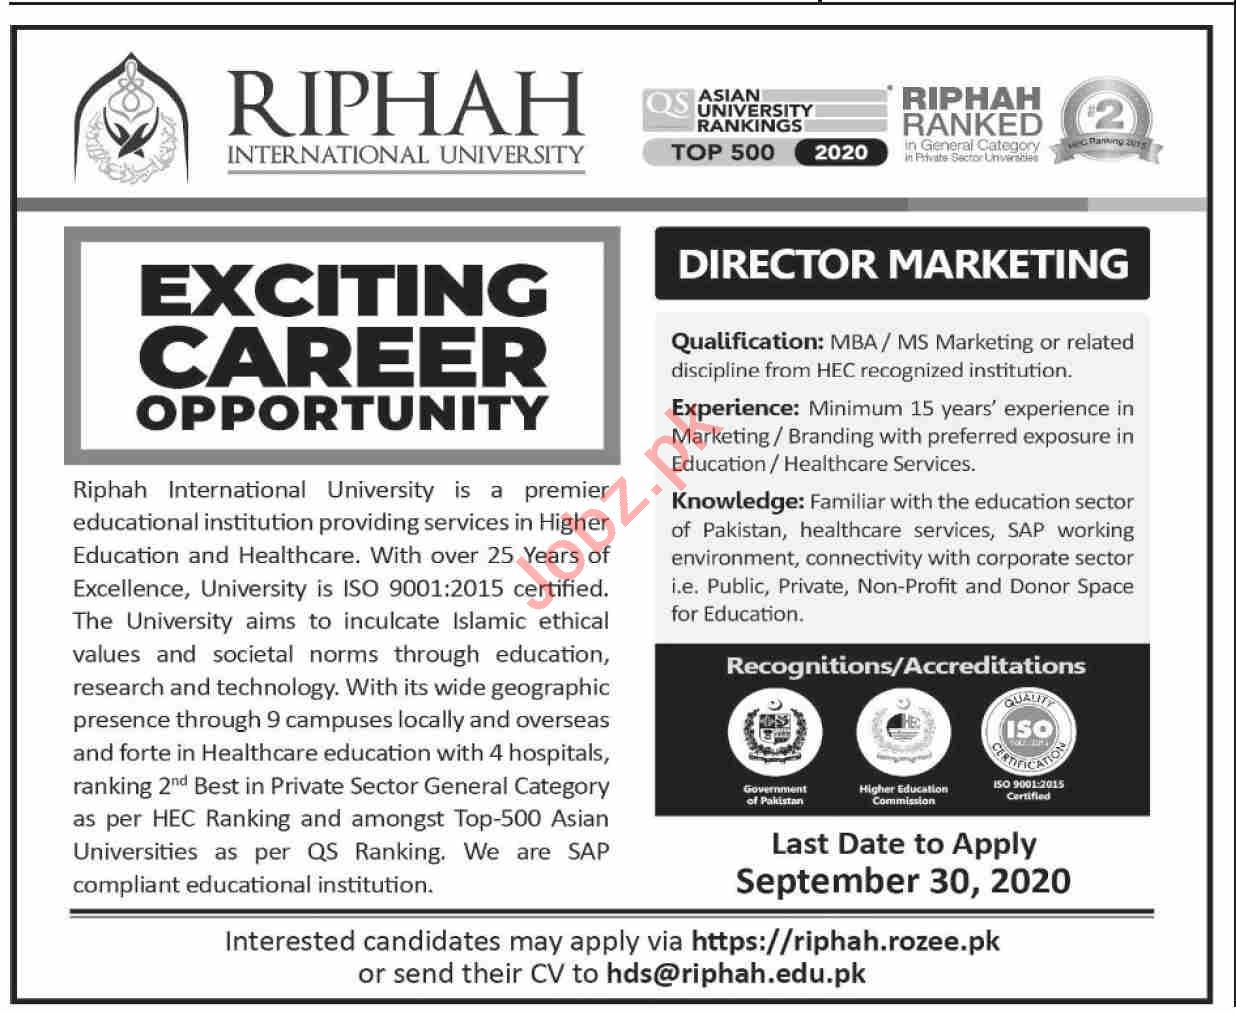 Riphah International University Jobs 2020 for Director